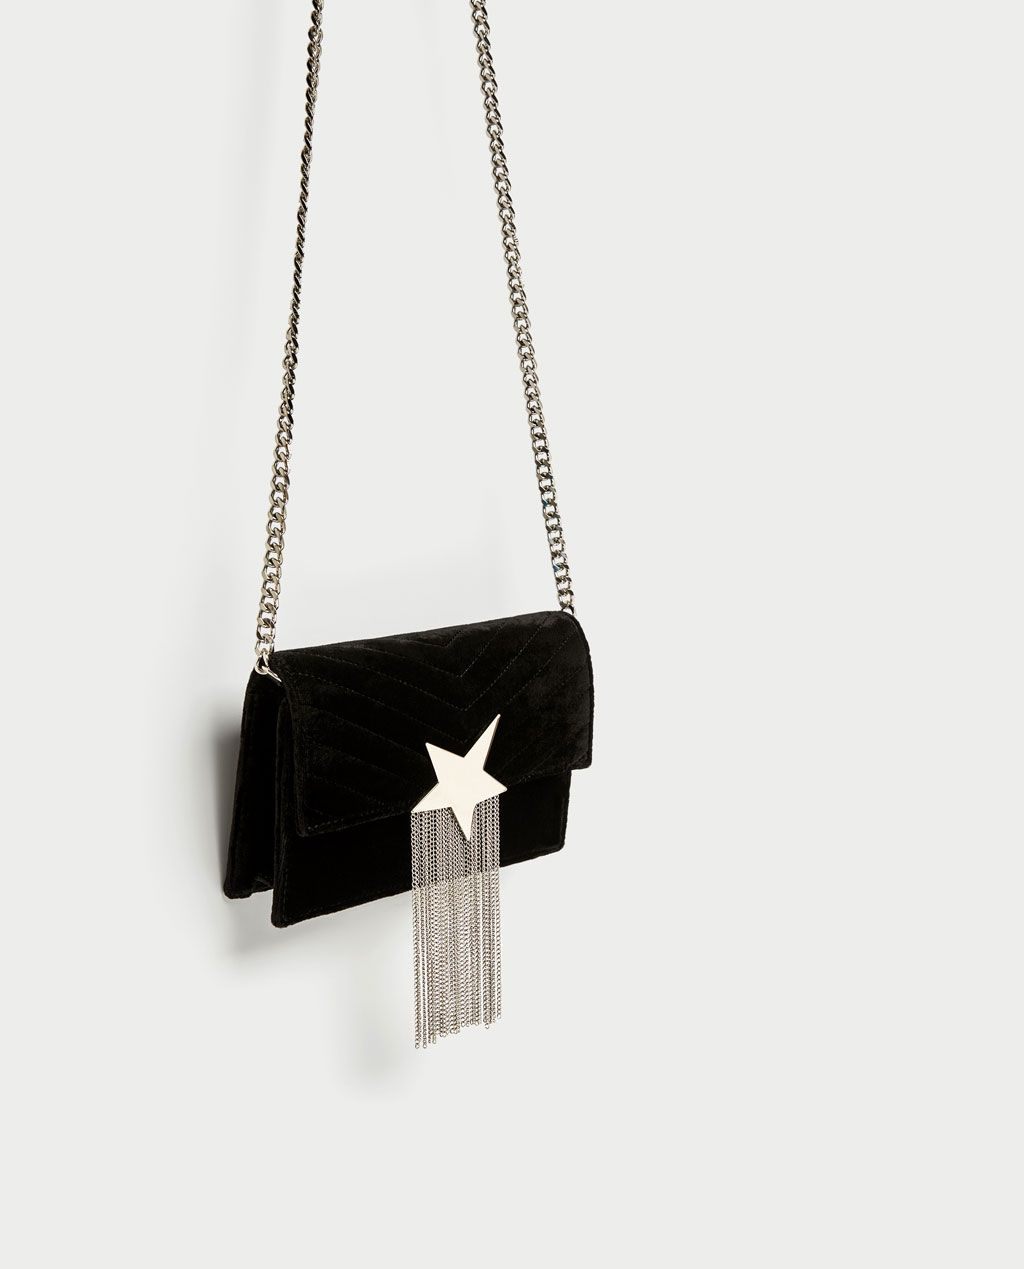 6d6de78bf63 Image 1 of CROSSBODY BAG WITH STAR DETAIL from Zara | Crossbody Bag ...